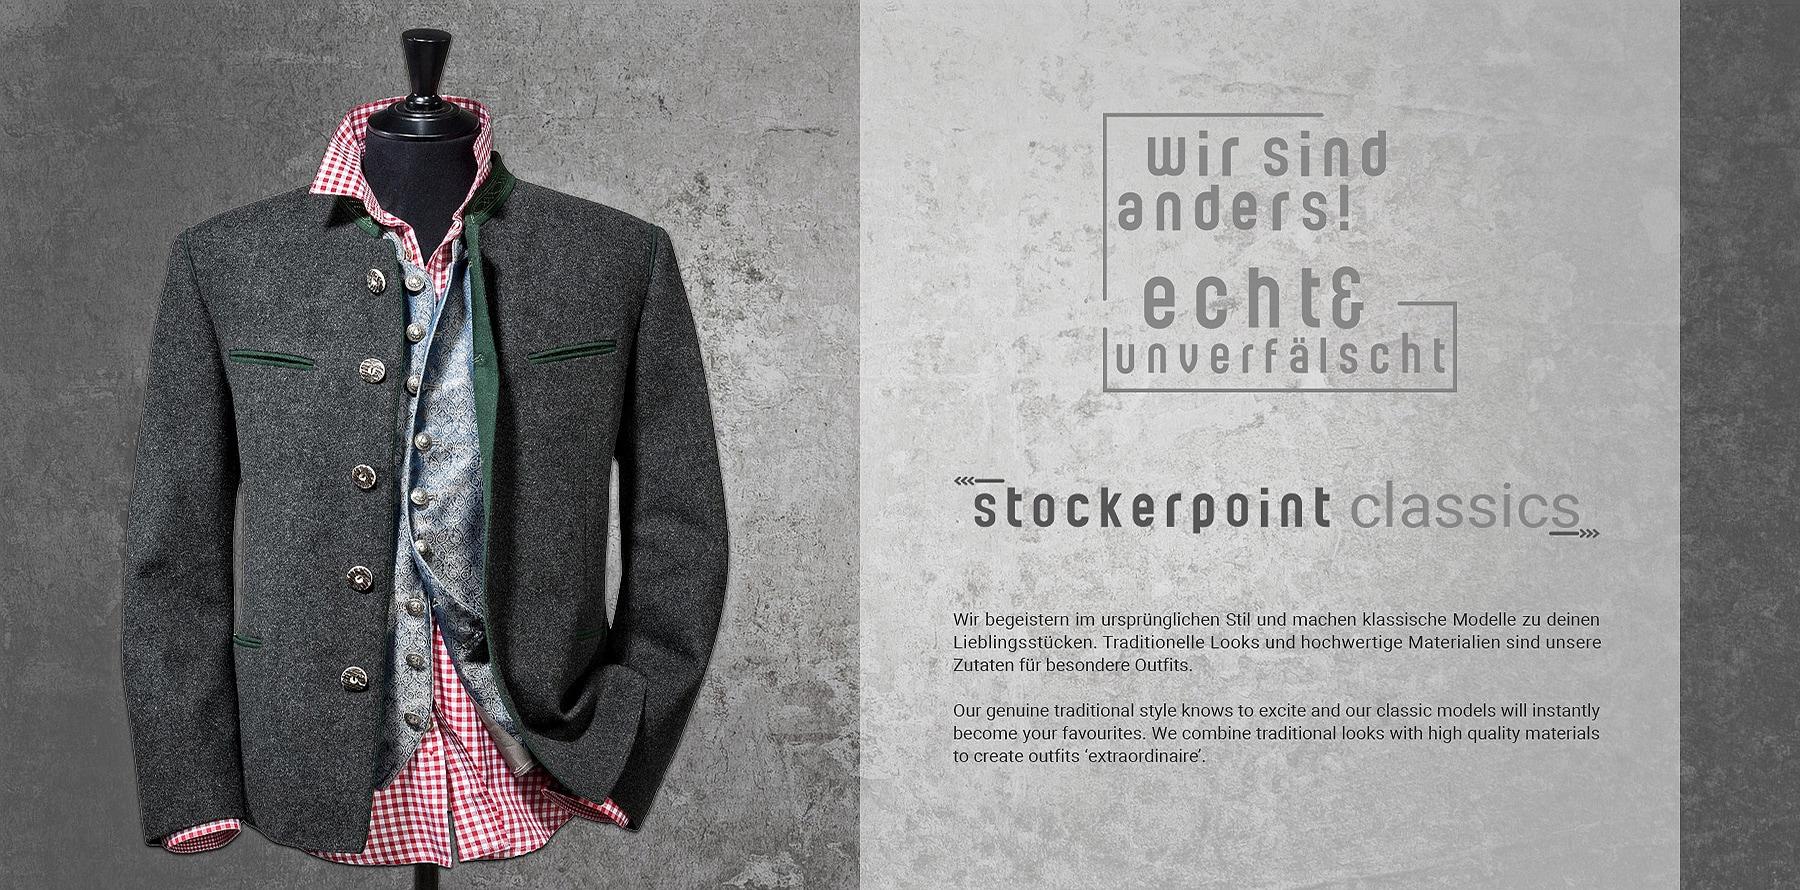 Stockerpoint Classics